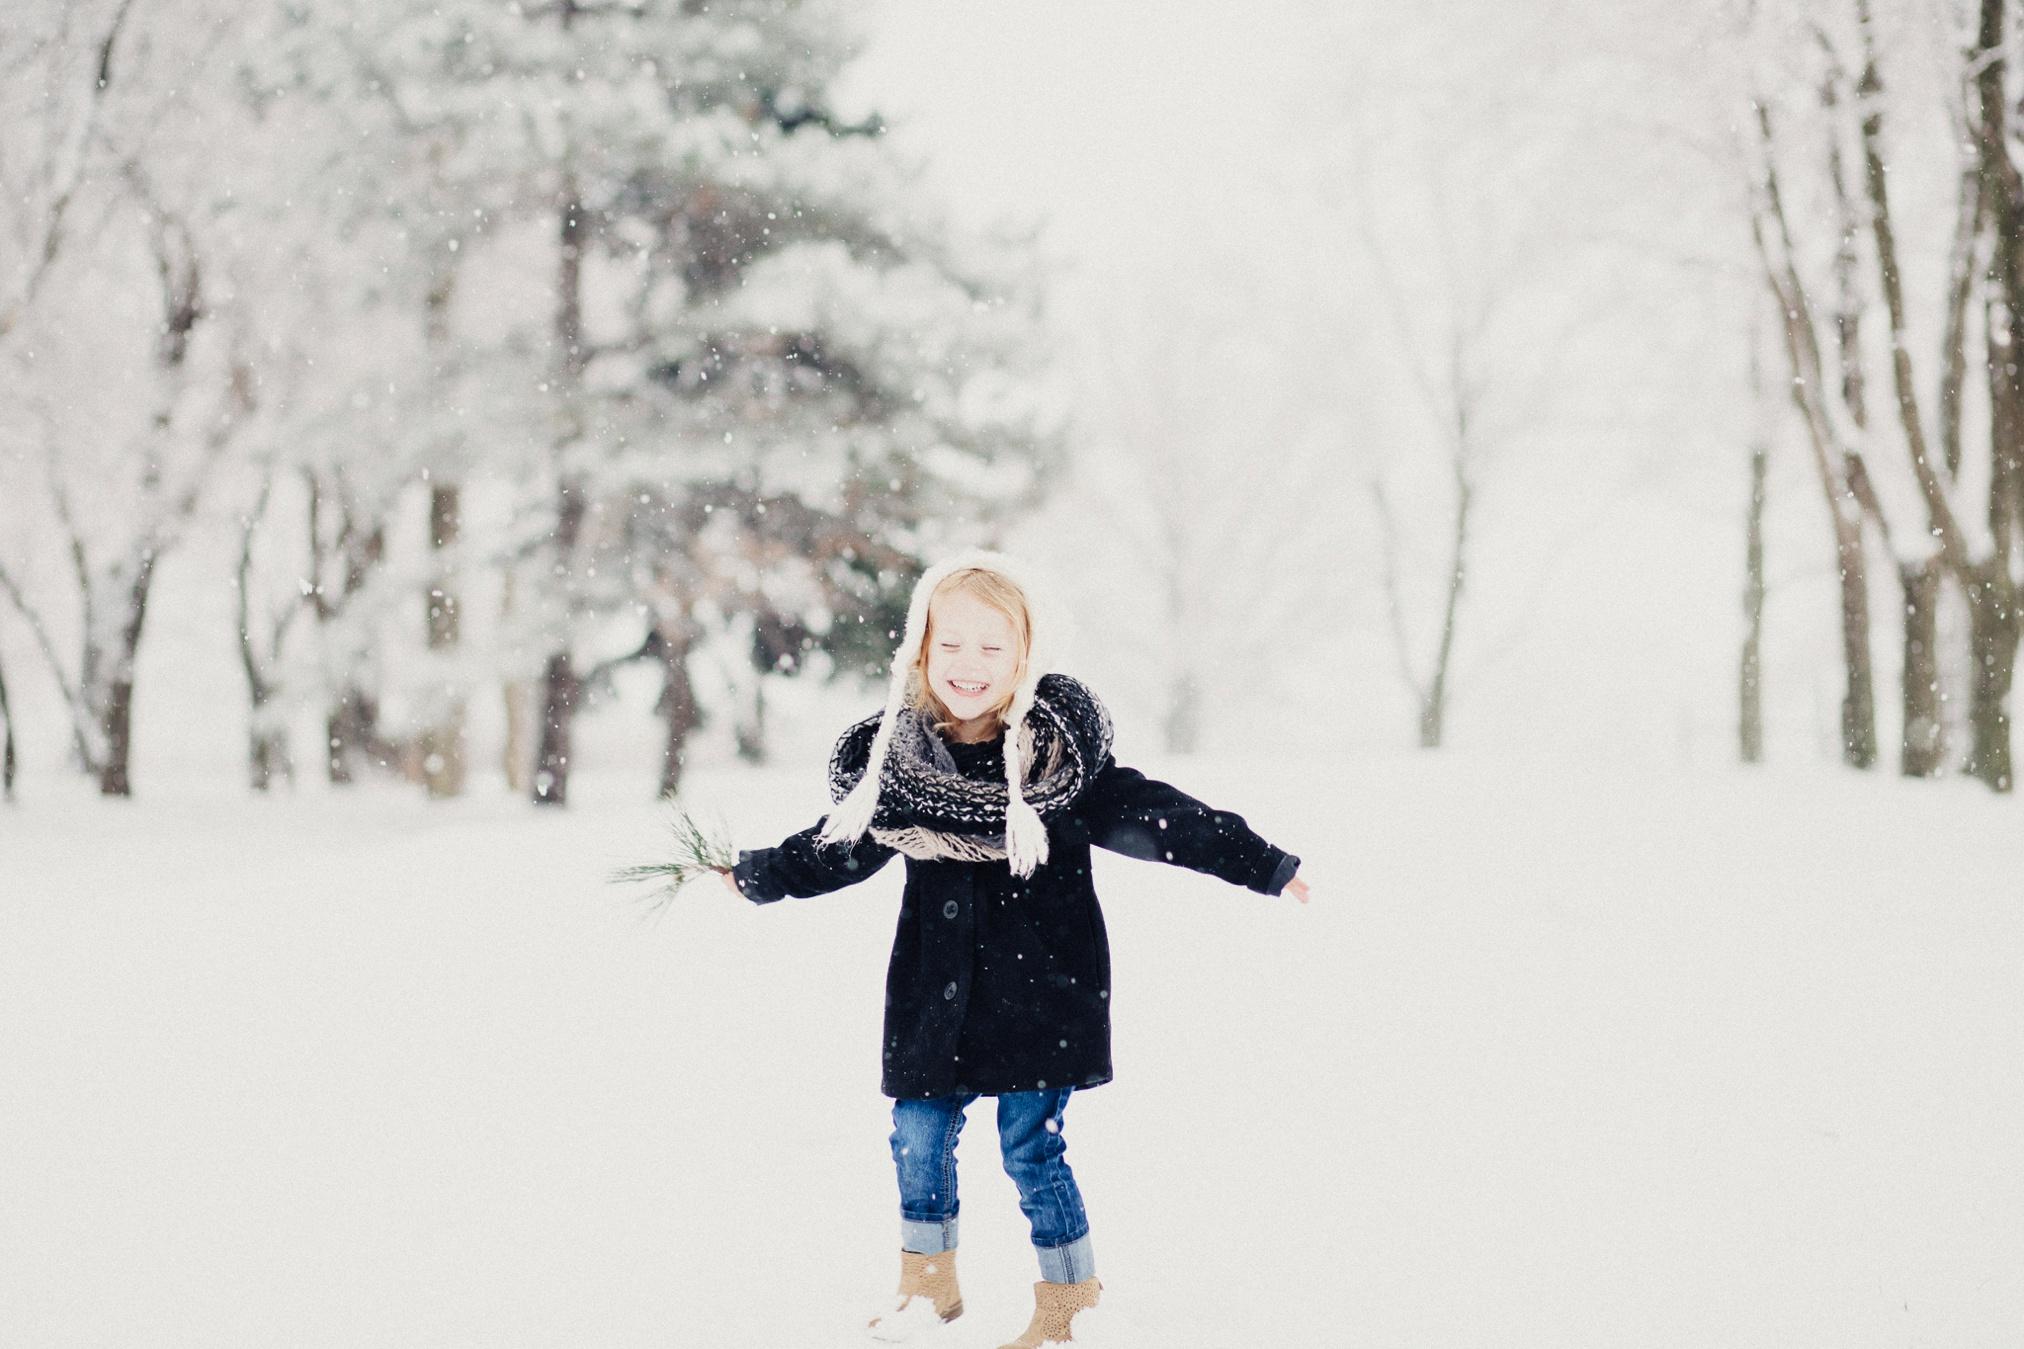 Zoe_Cohen_Snow_2015_web-32.jpg